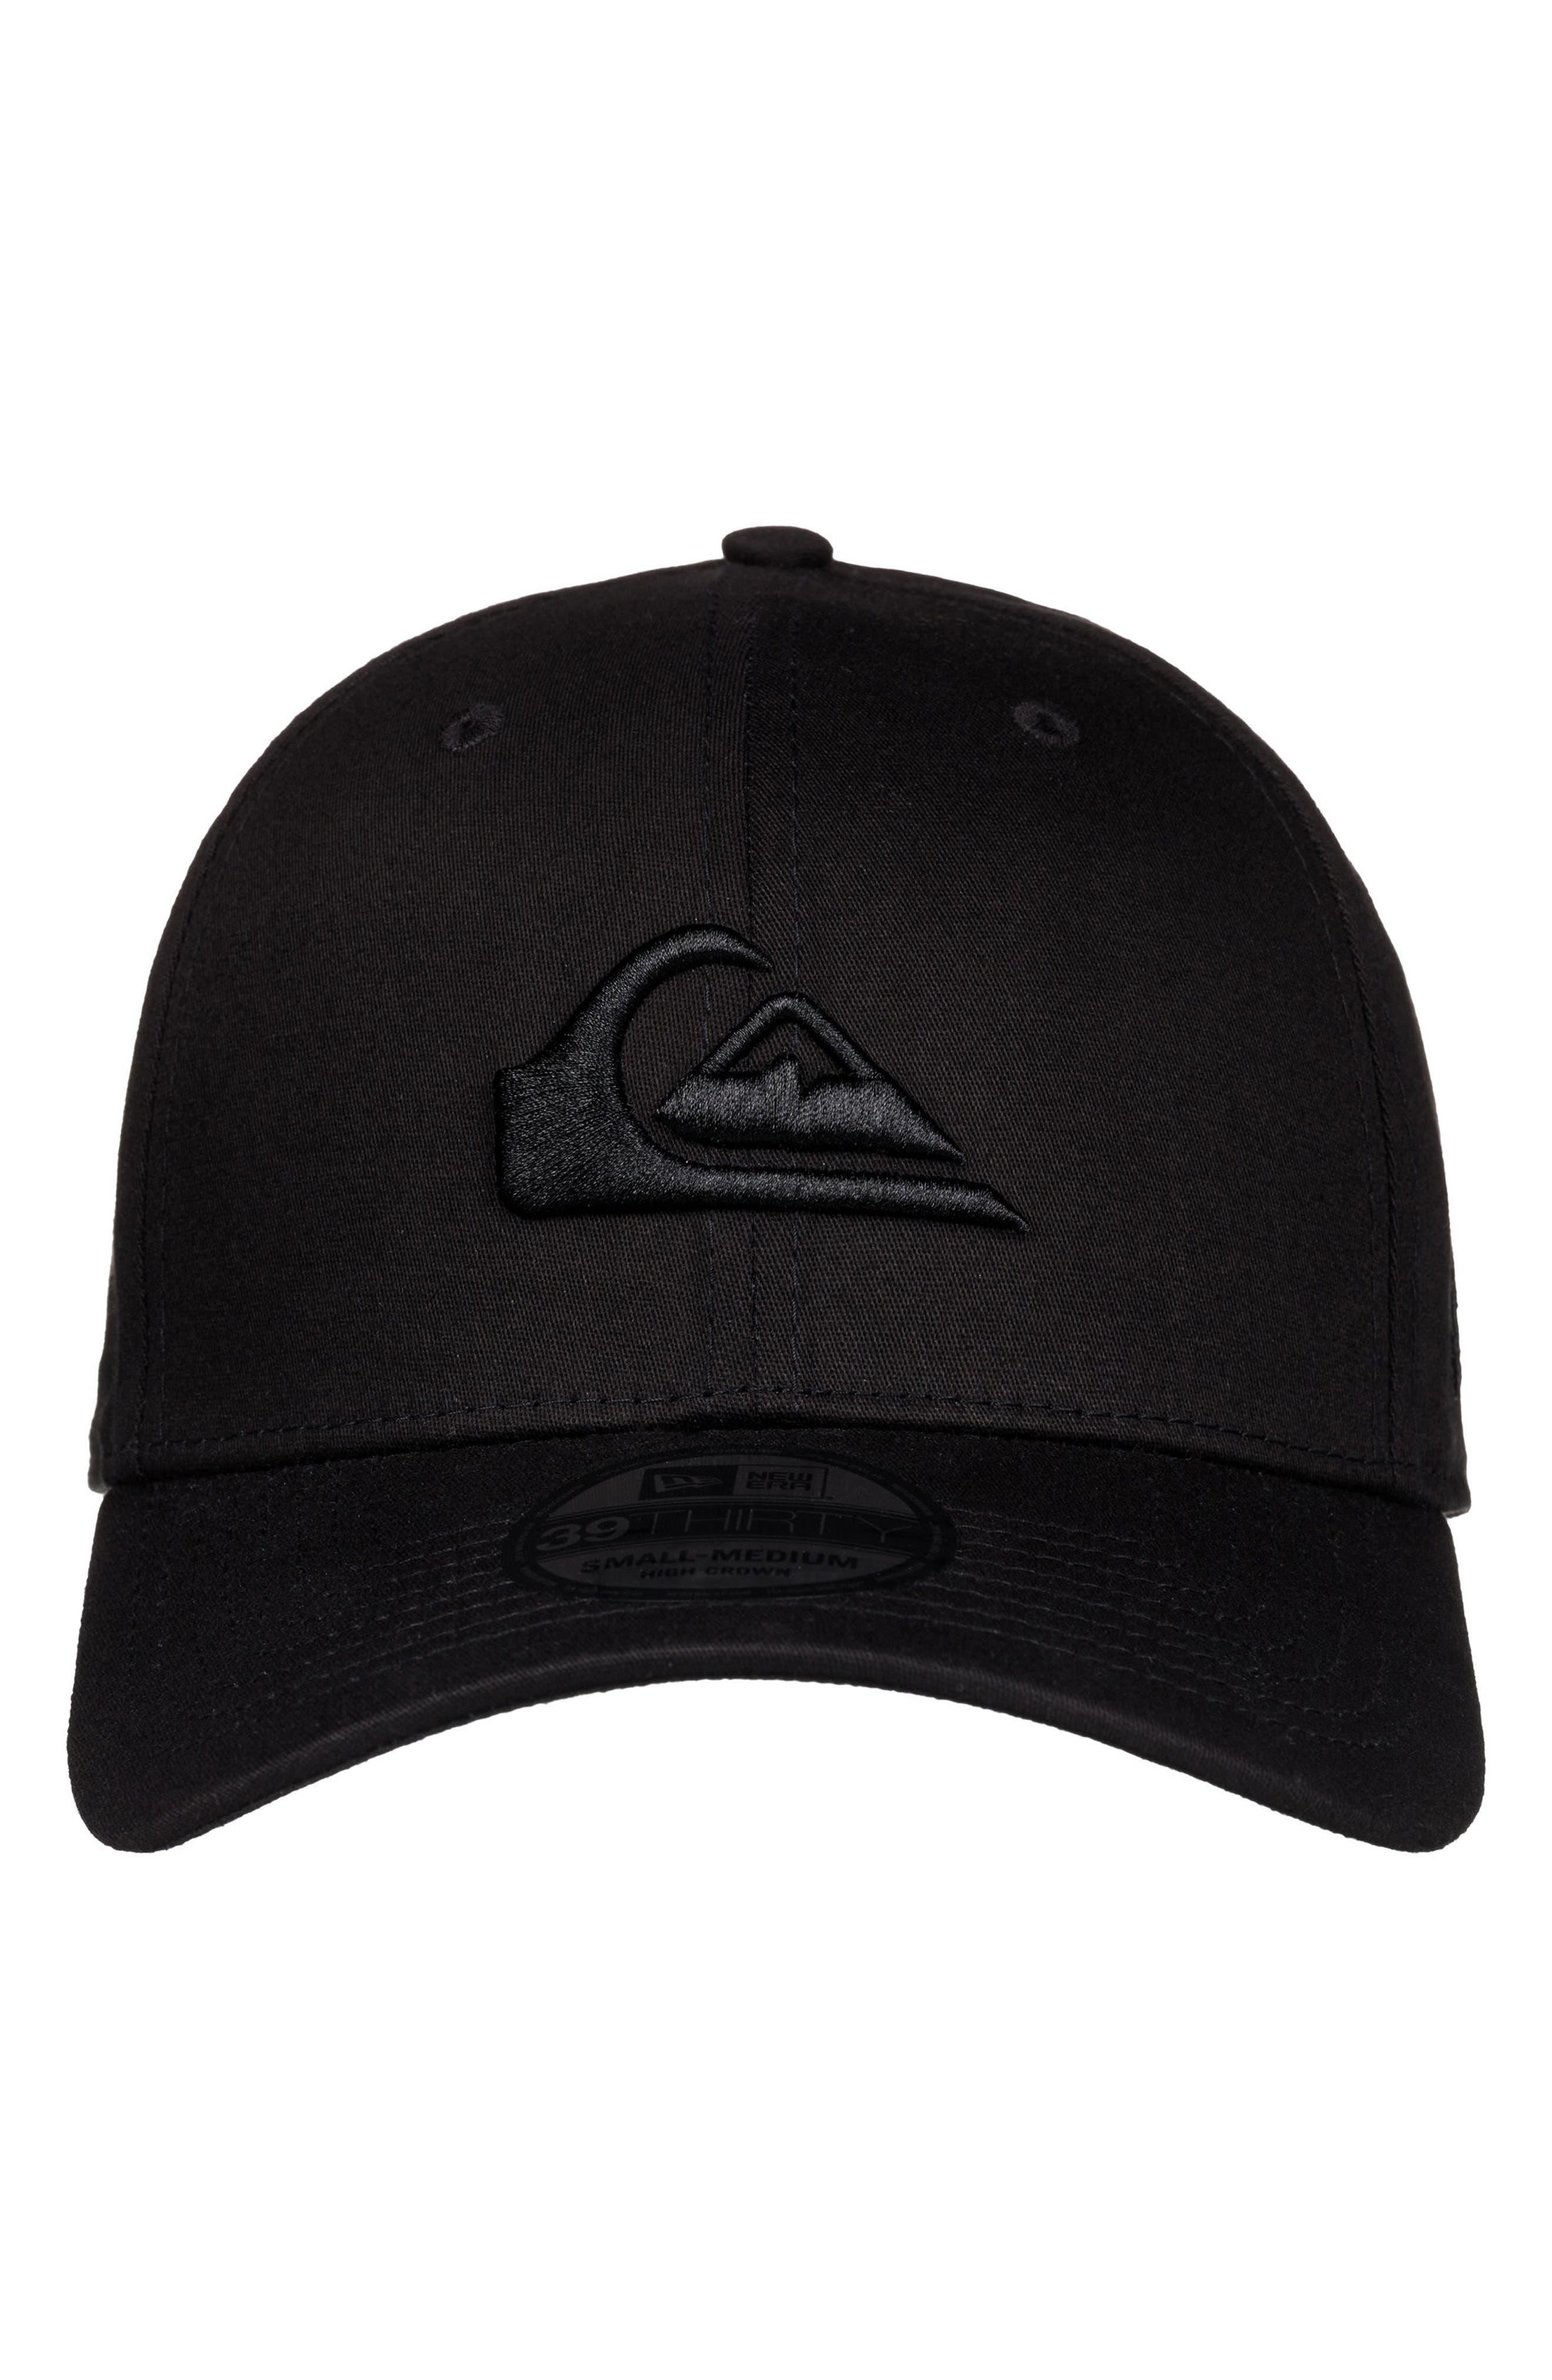 Mountain & Wave Baseball Cap,                             Alternate thumbnail 2, color,                             BLACK